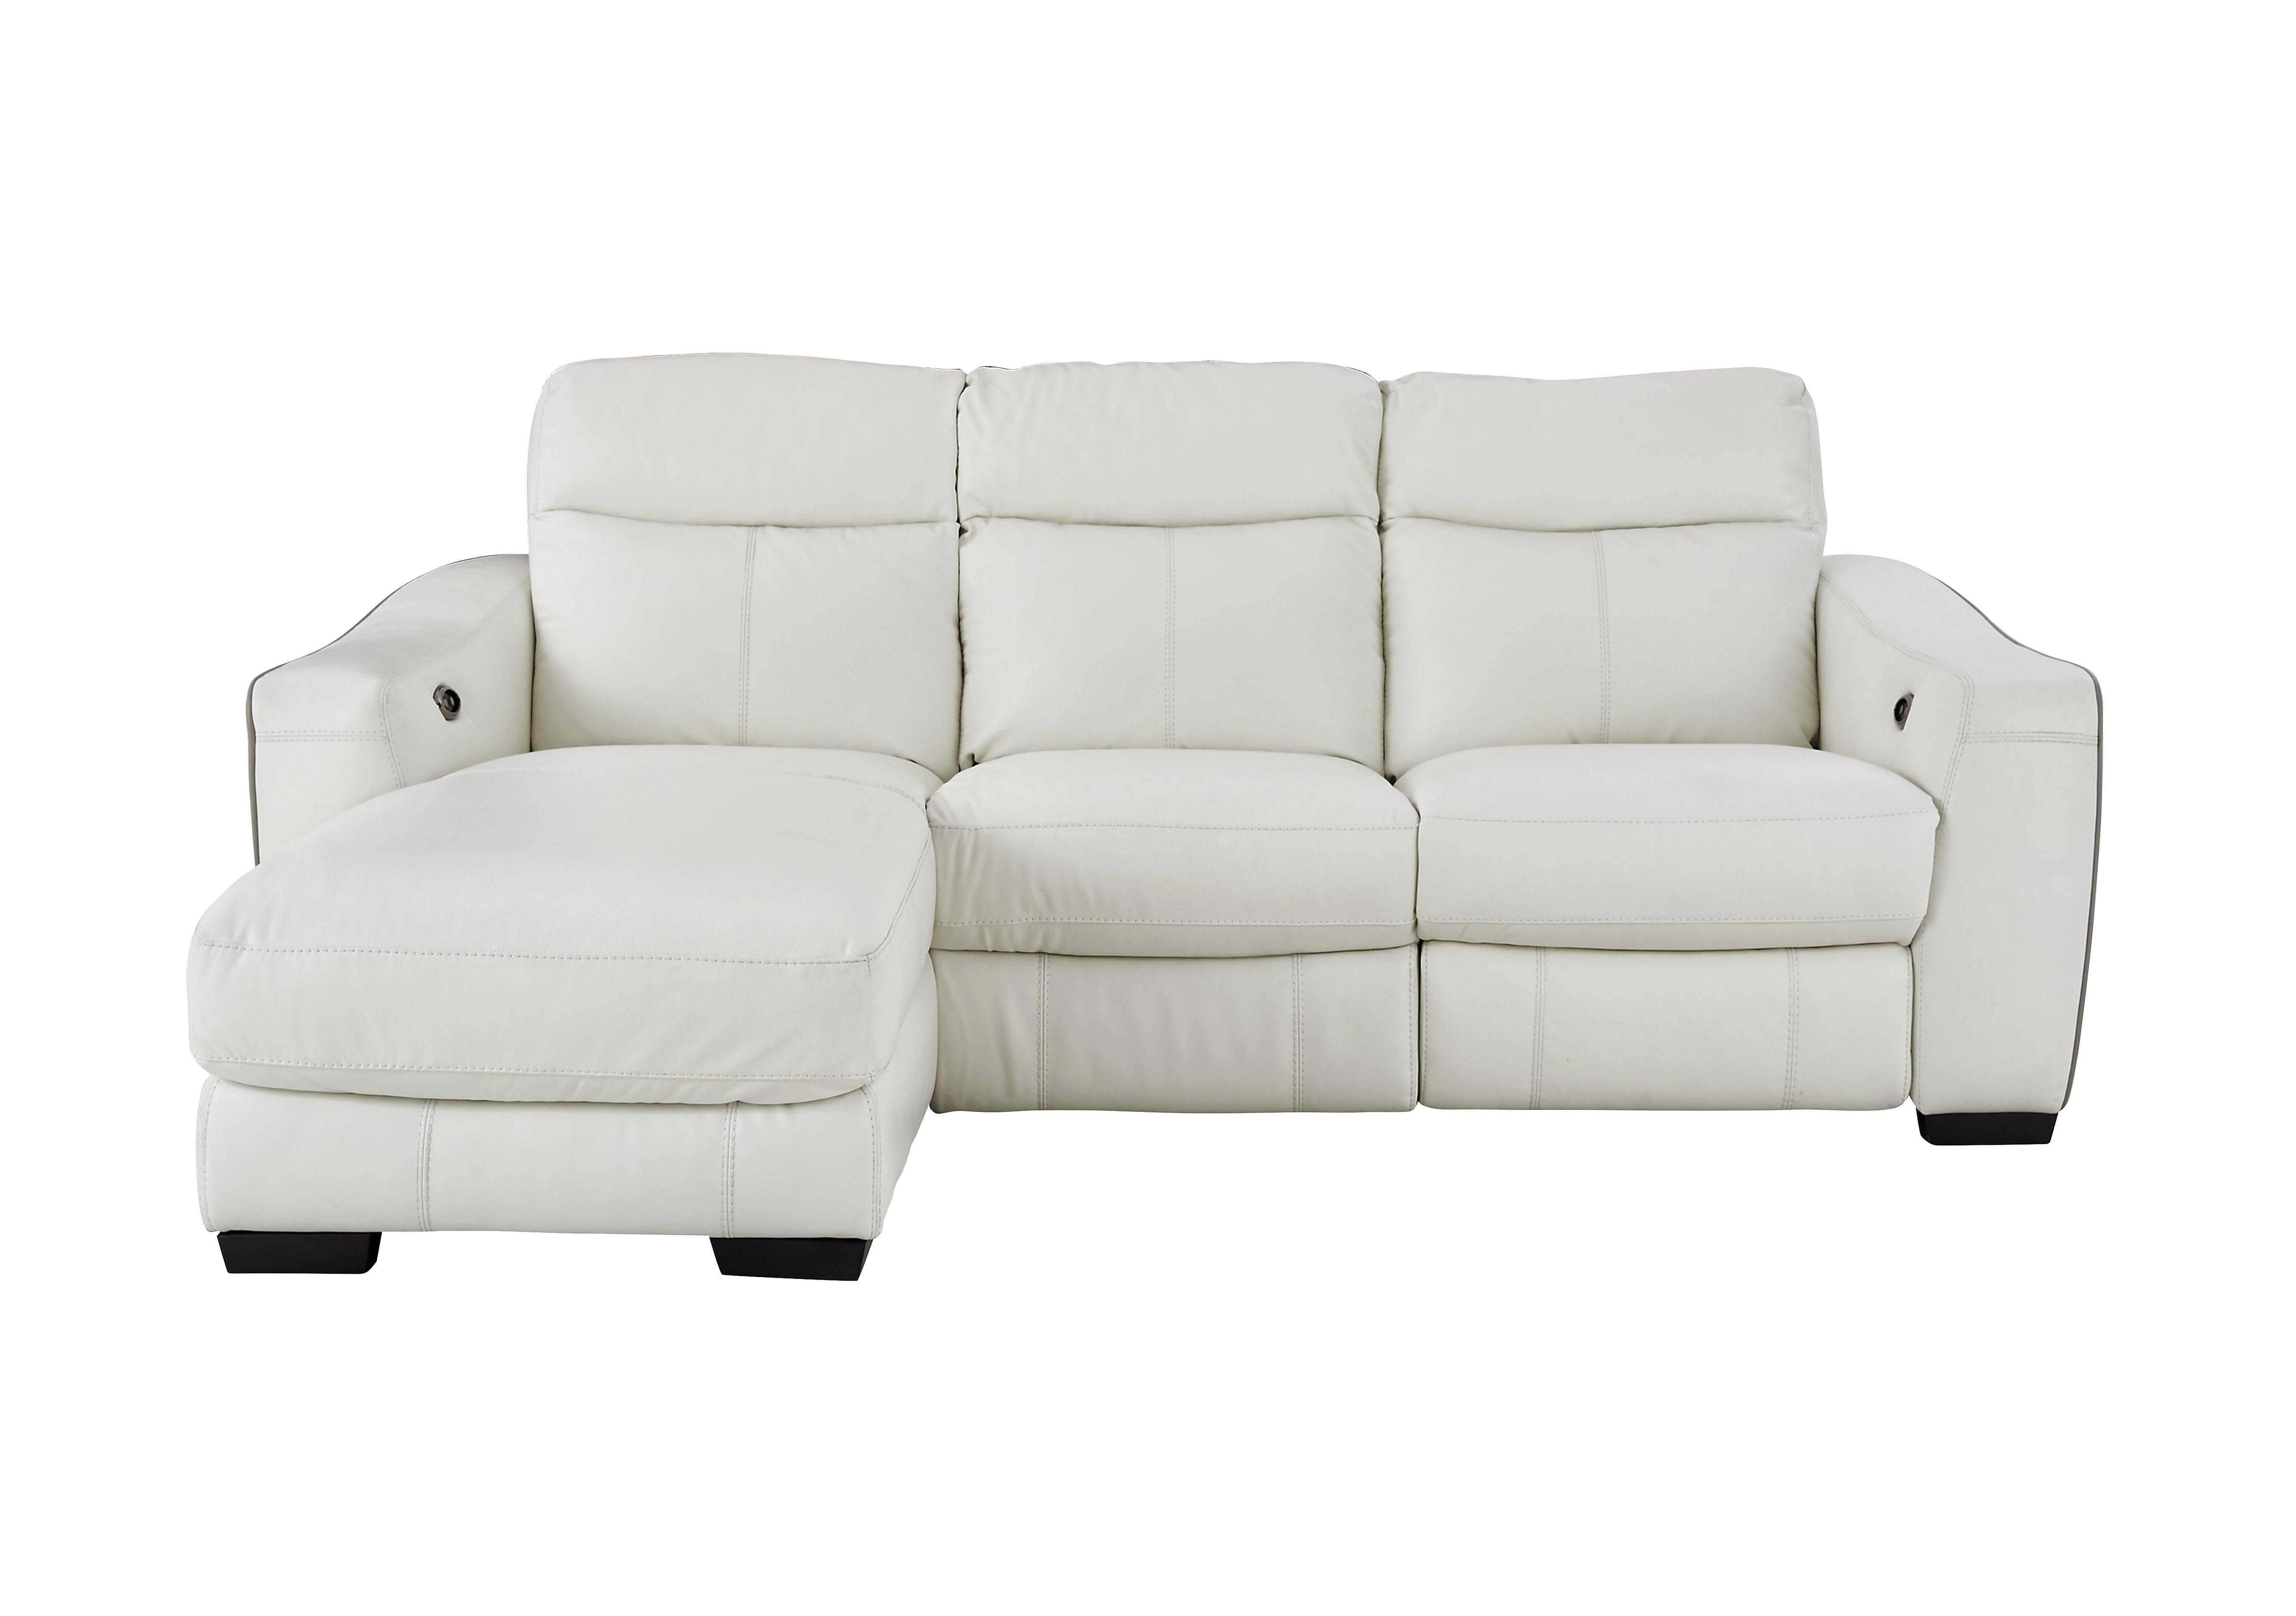 Cressida Leather Recliner Corner Chaise Sofa Furniture Village